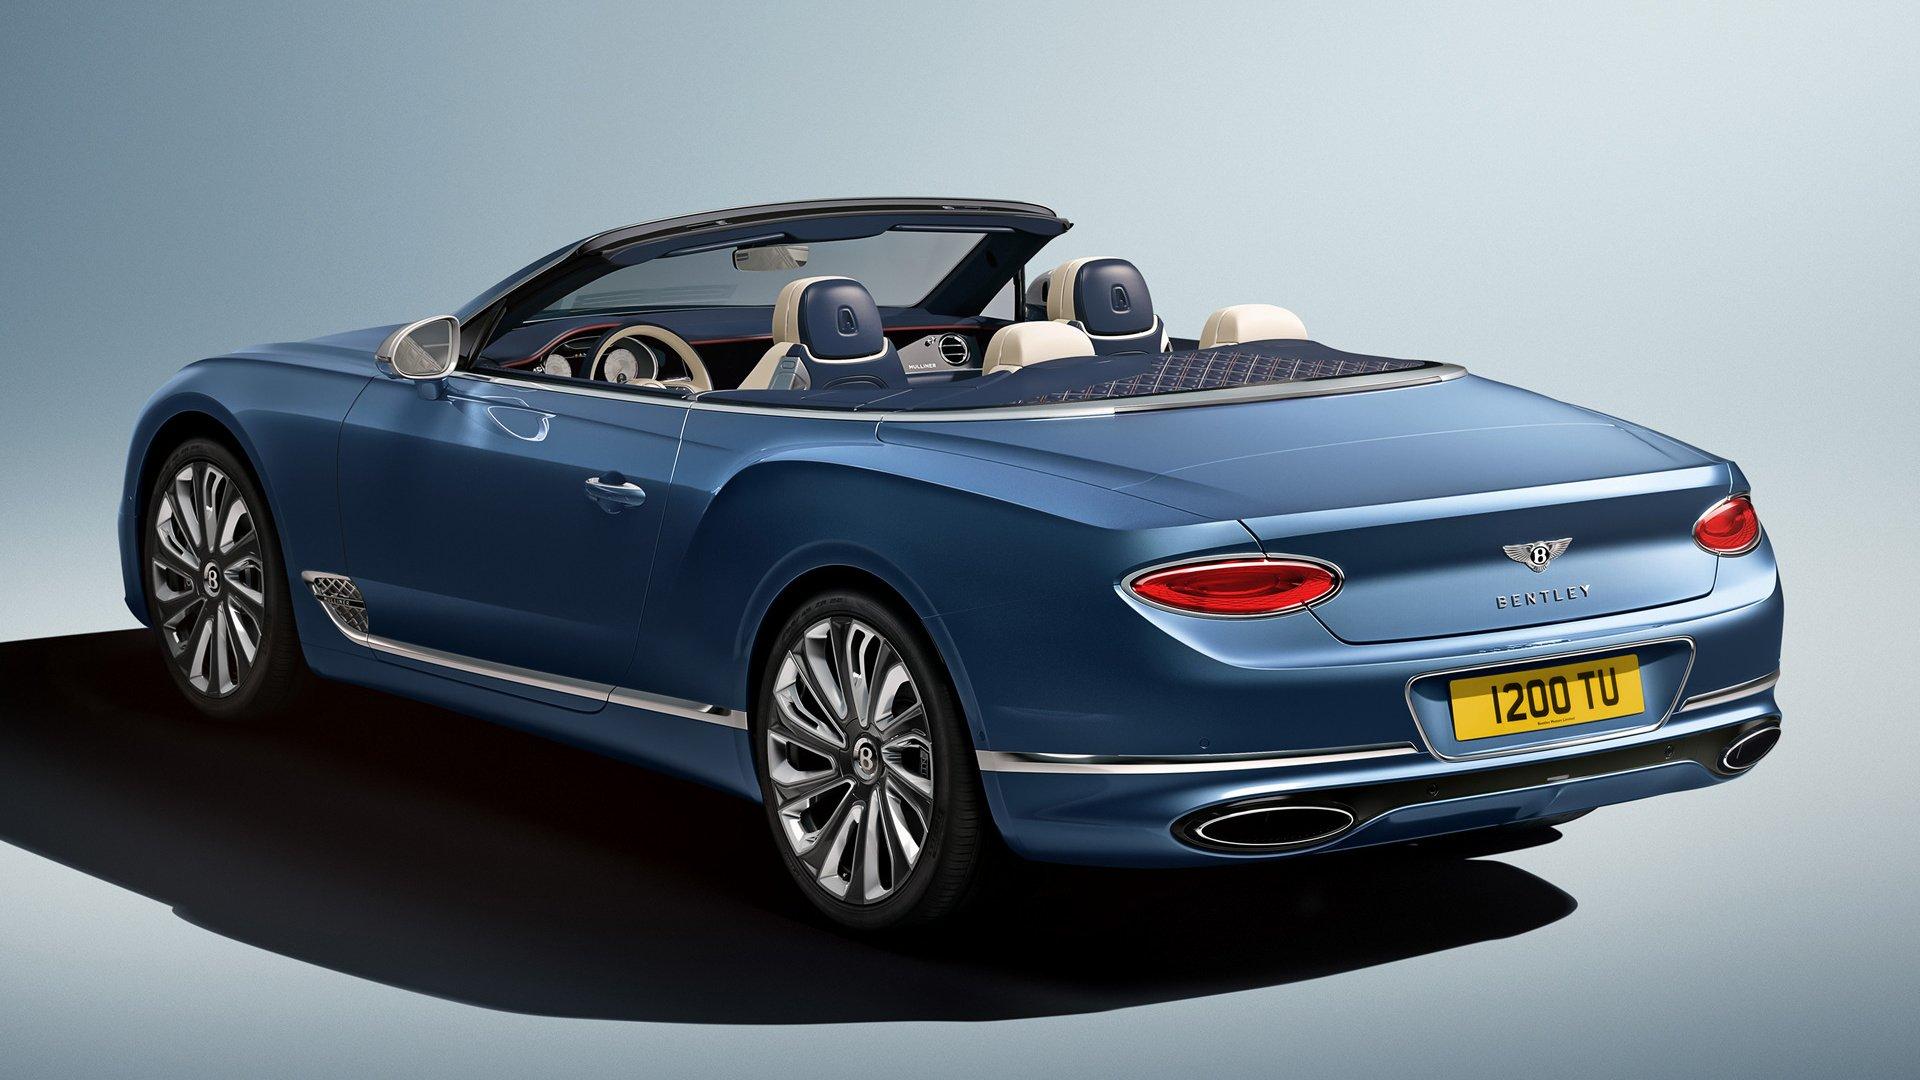 2020 Bentley Continental Gt Convertible By Mulliner Papel De Parede Hd Plano De Fundo 1920x1080 Id 1069518 Wallpaper Abyss